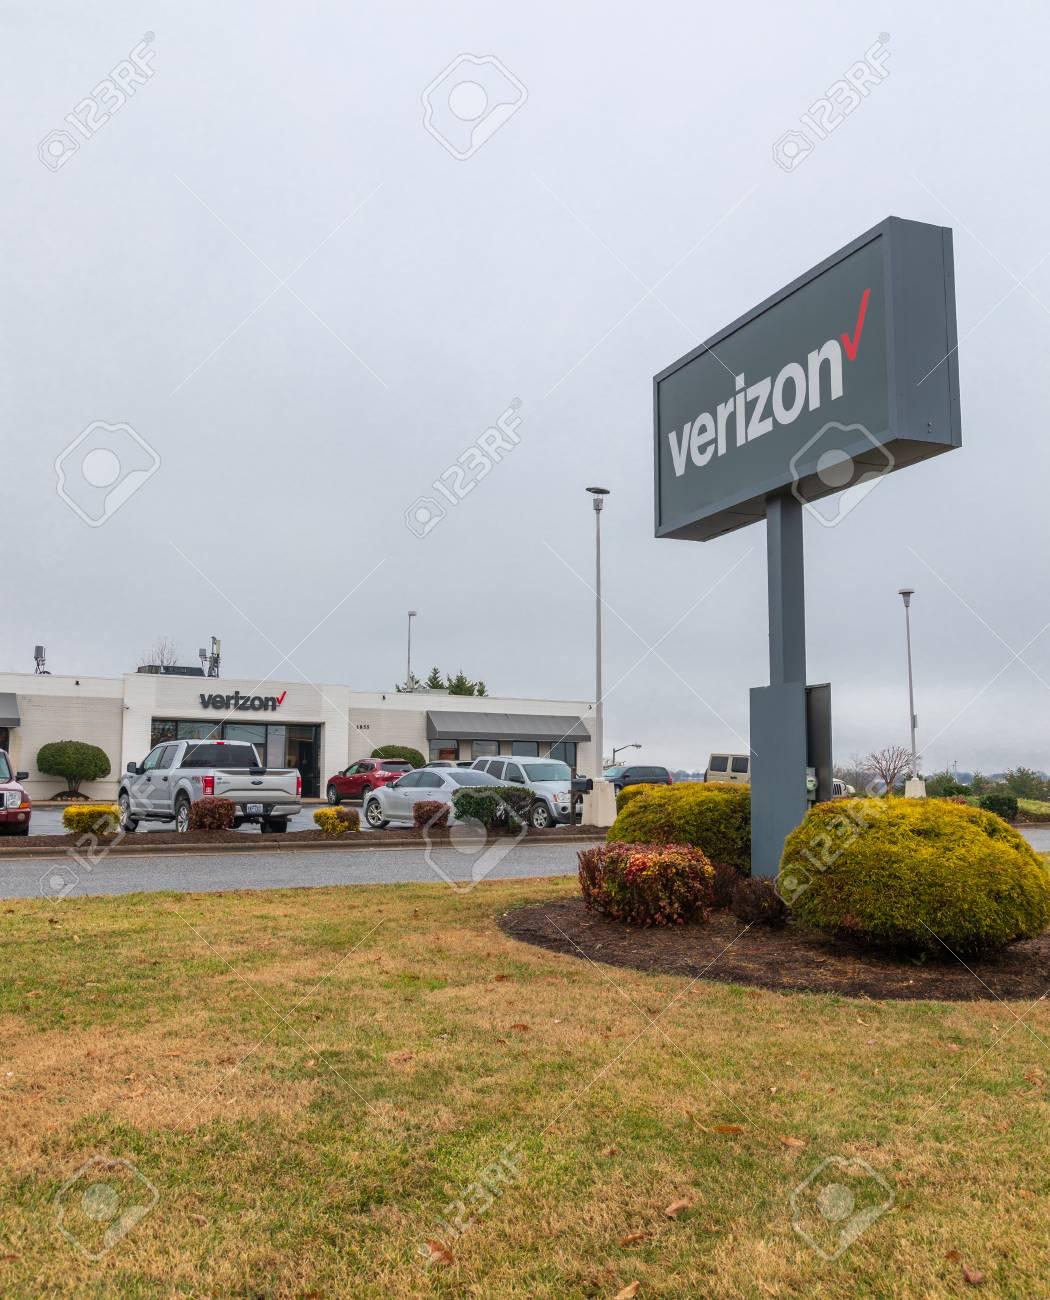 HICKORY, NC, USA-1/3/19: Verizon retail building and sign, selling